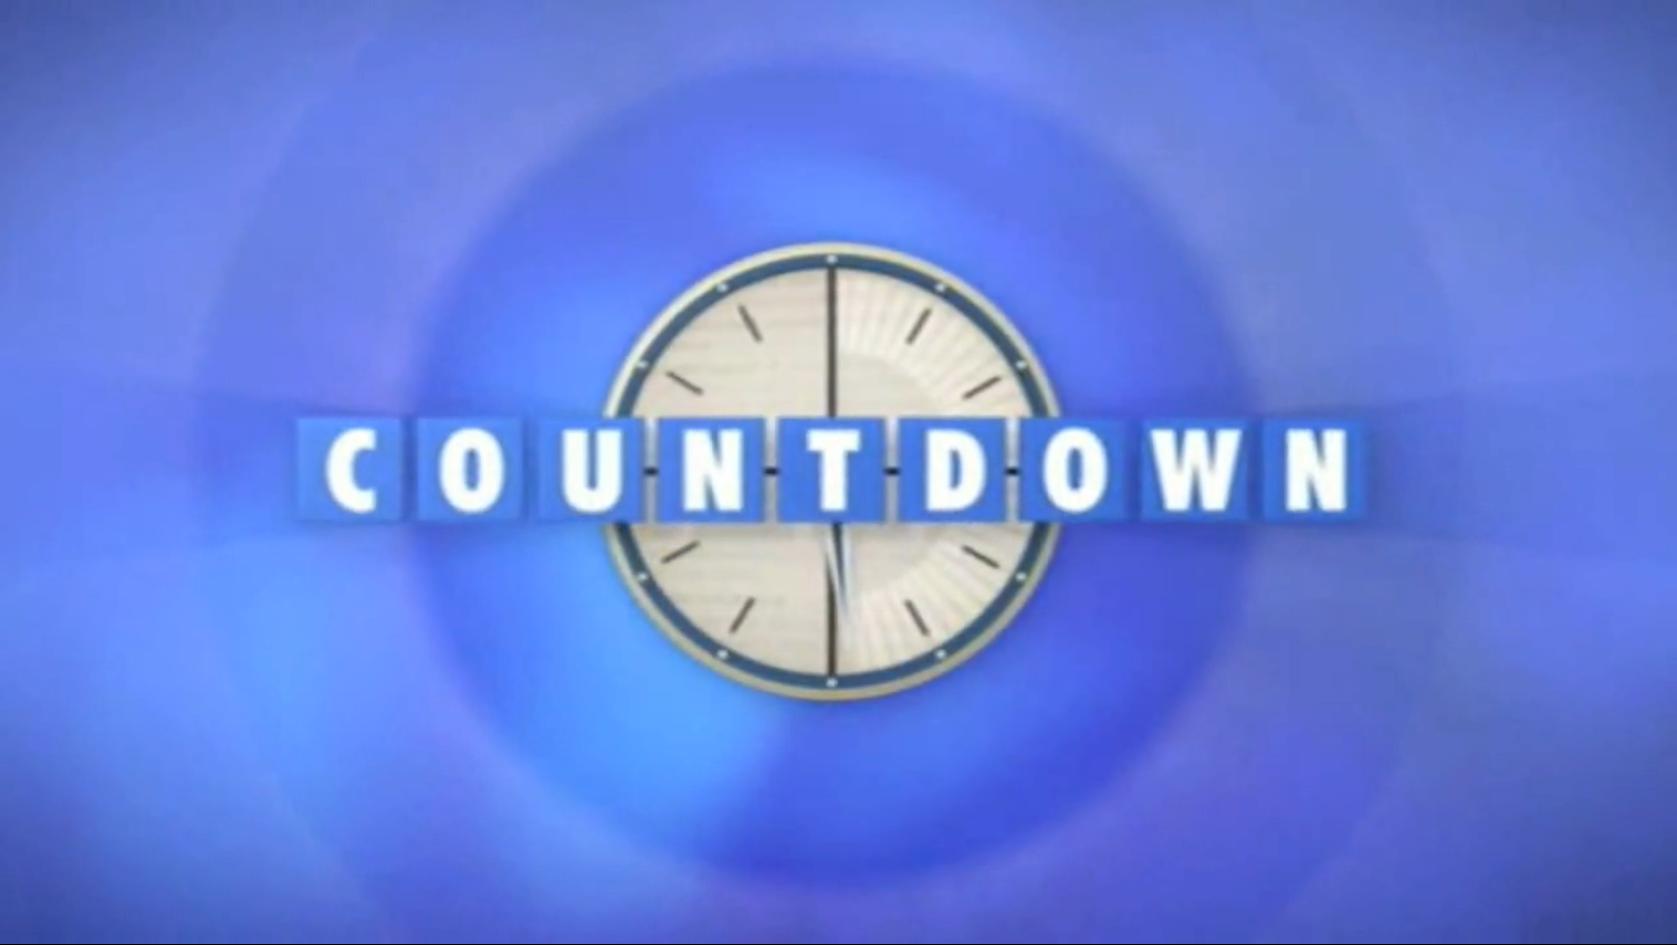 TickCounter - Countdown Timer